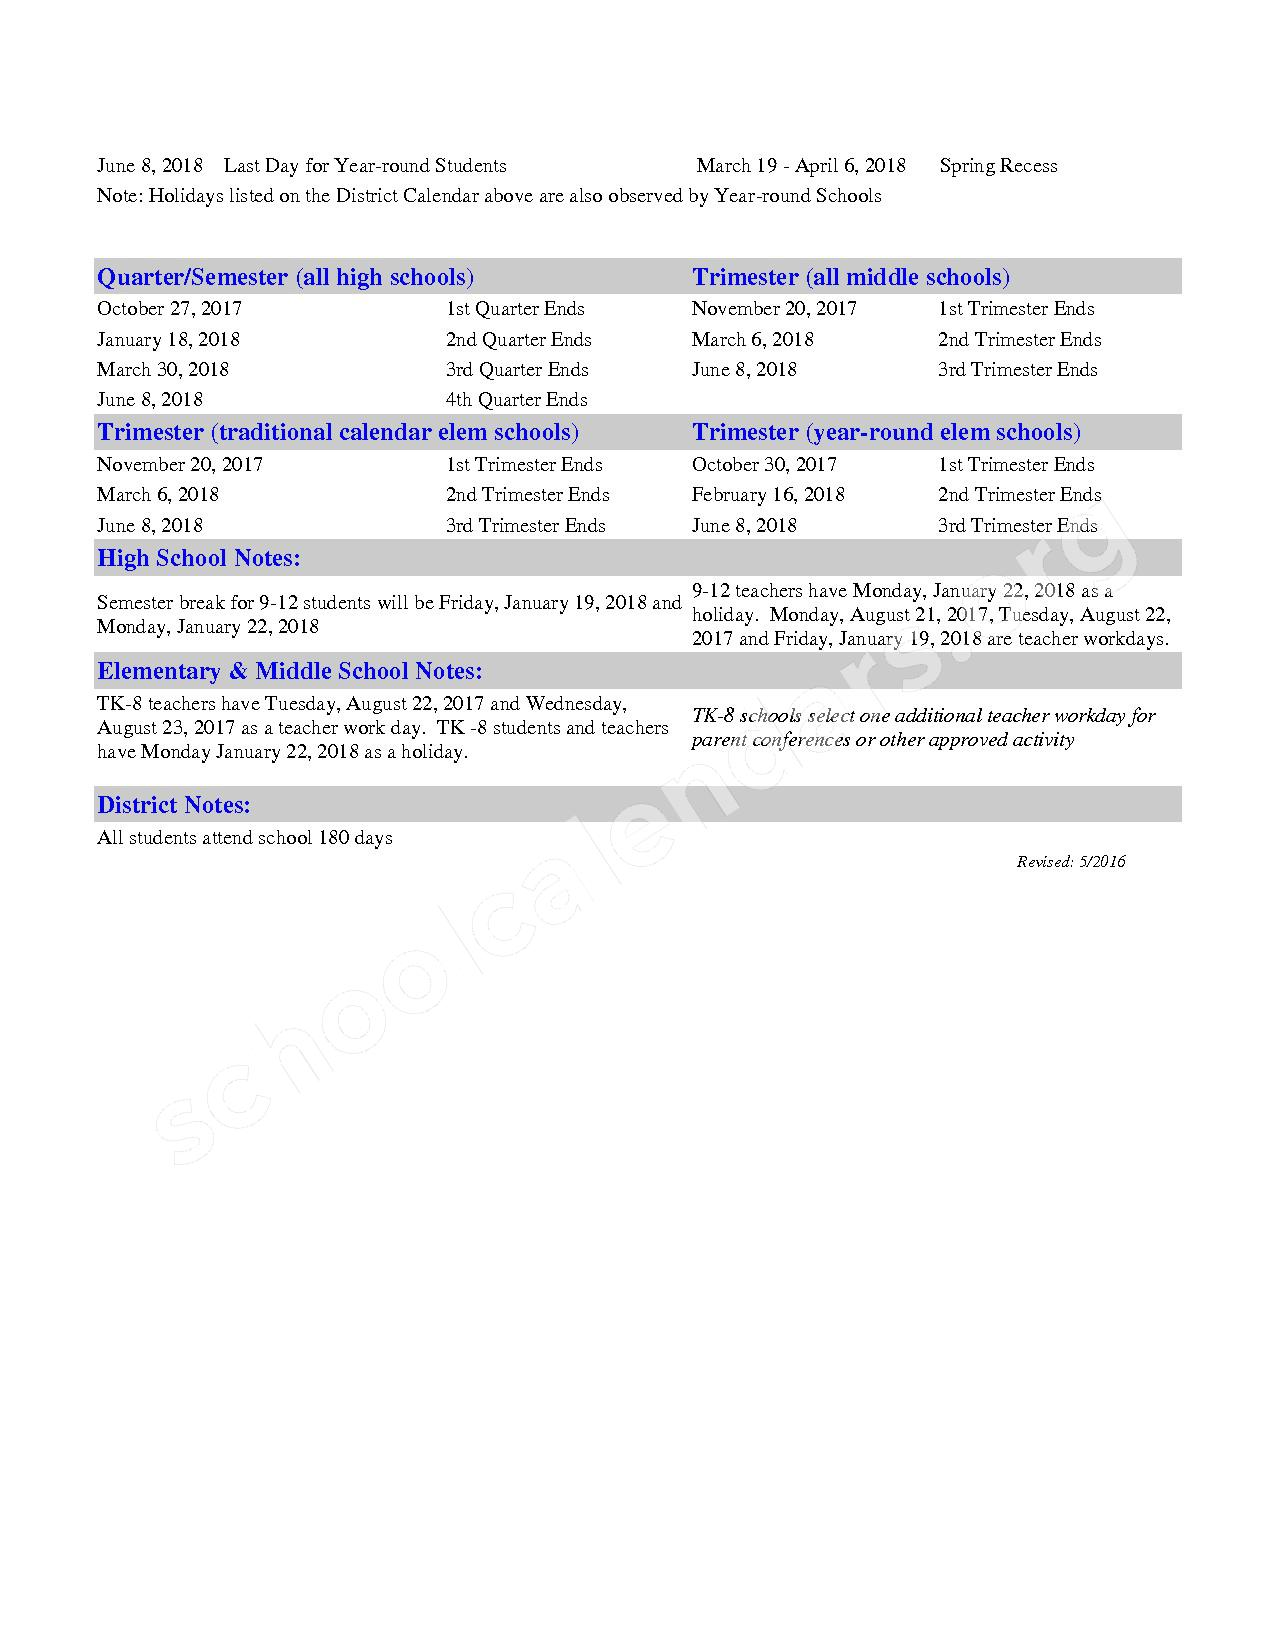 irvine school district calendar 12 Quick Tips For Irvine